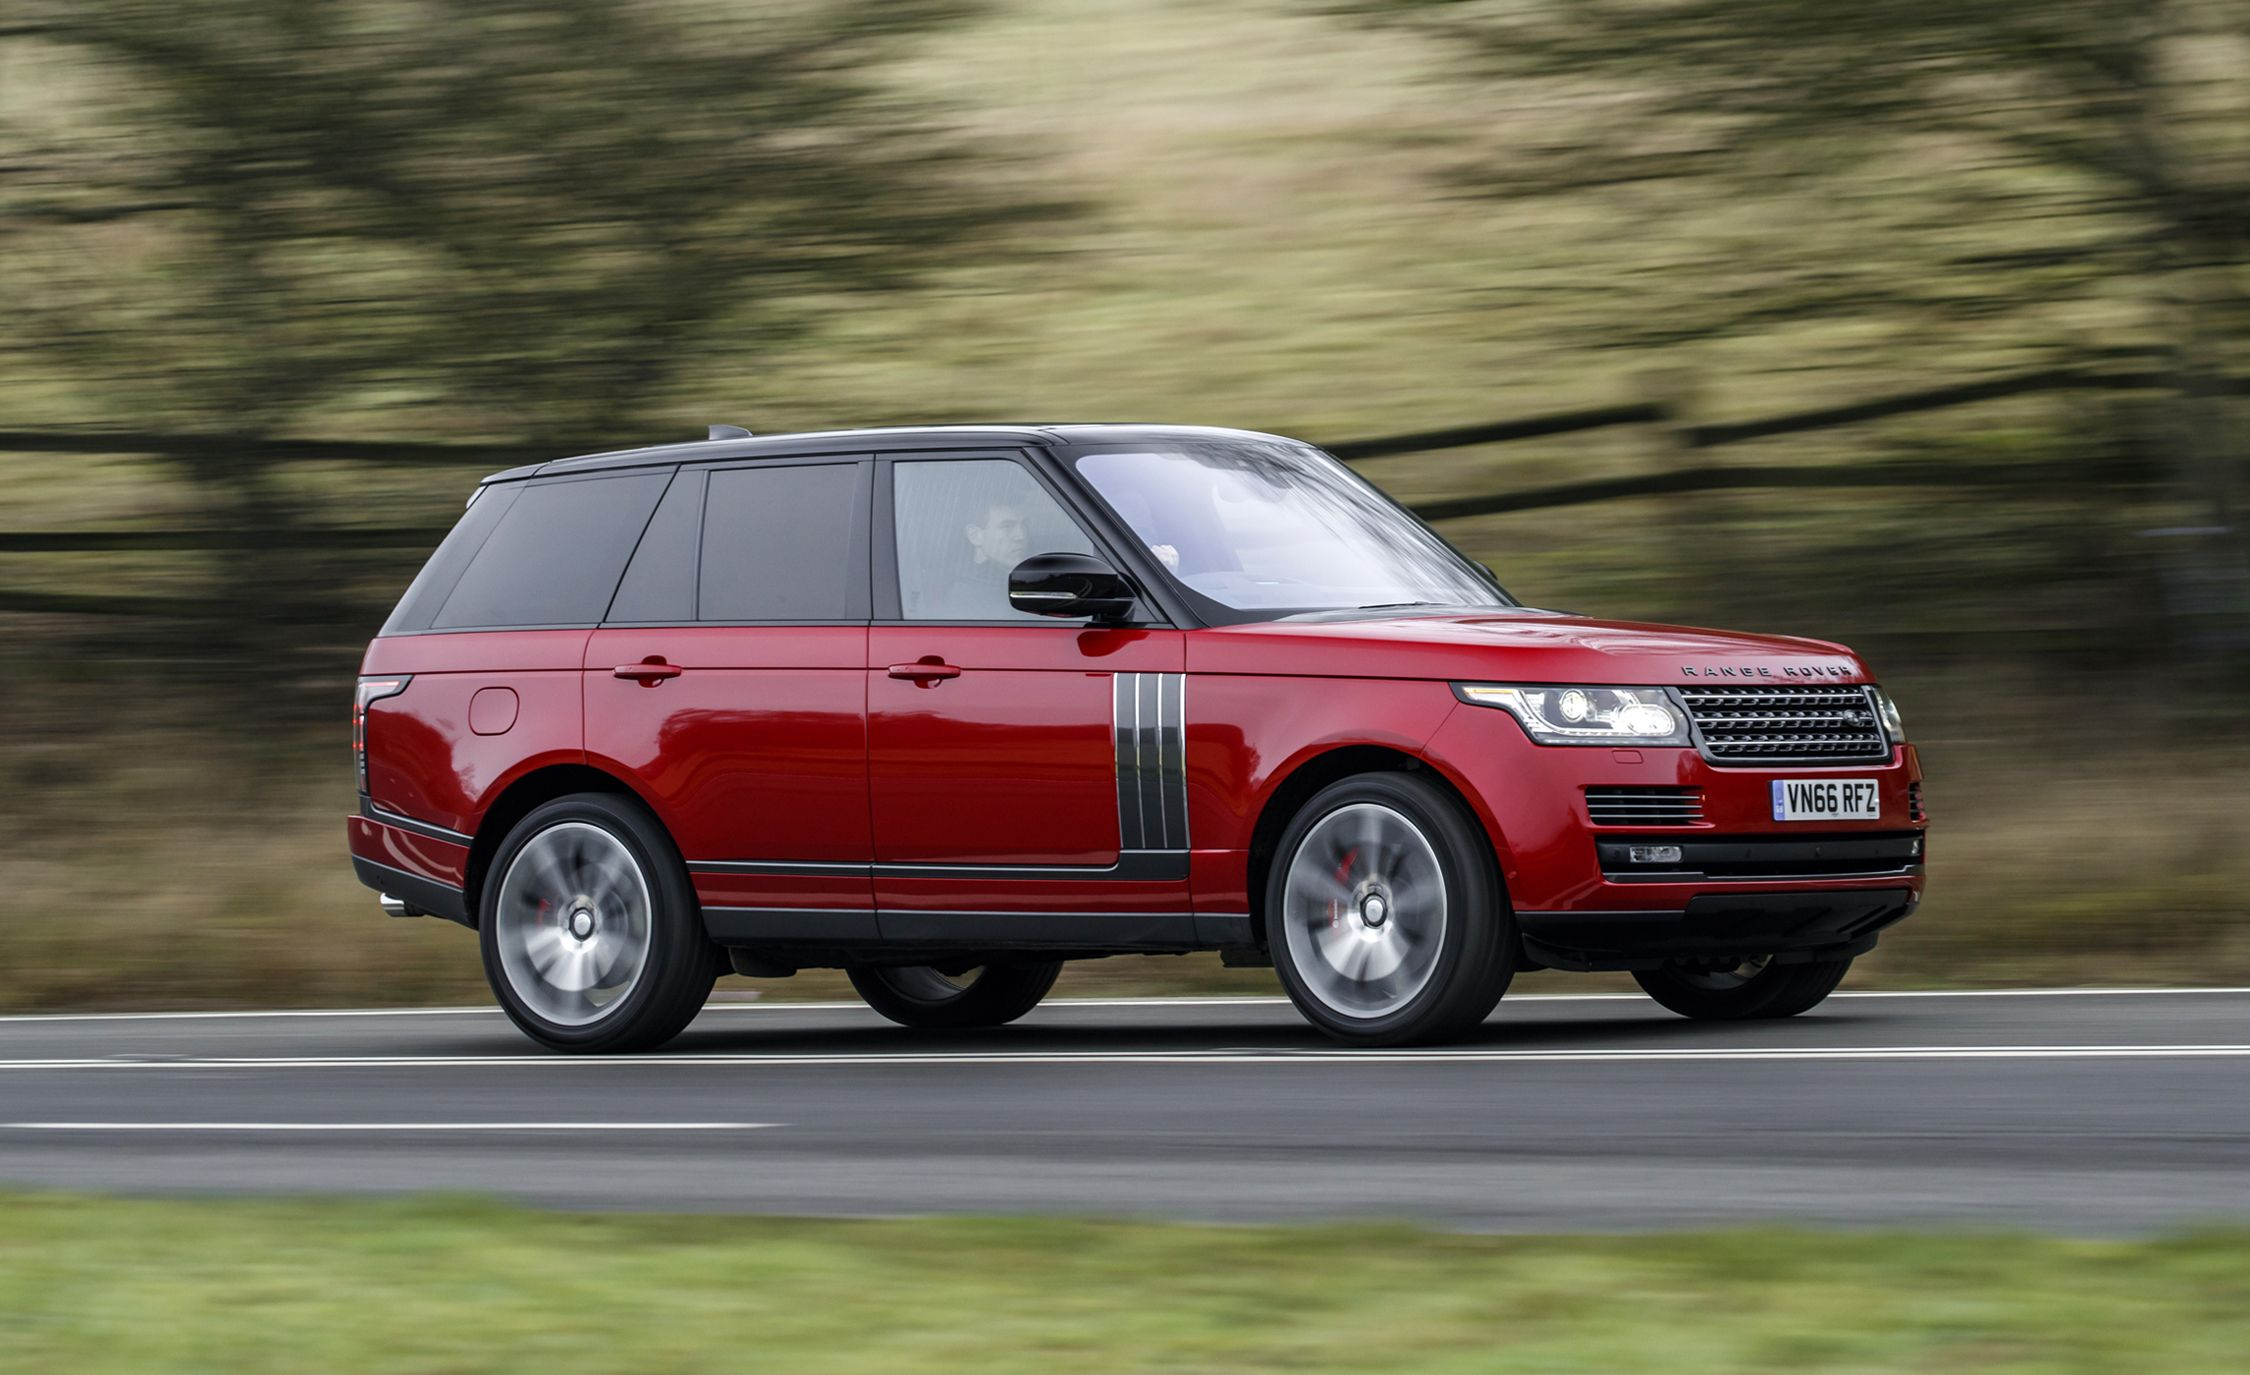 2017 Range Rover SVAutobiography Dynamic